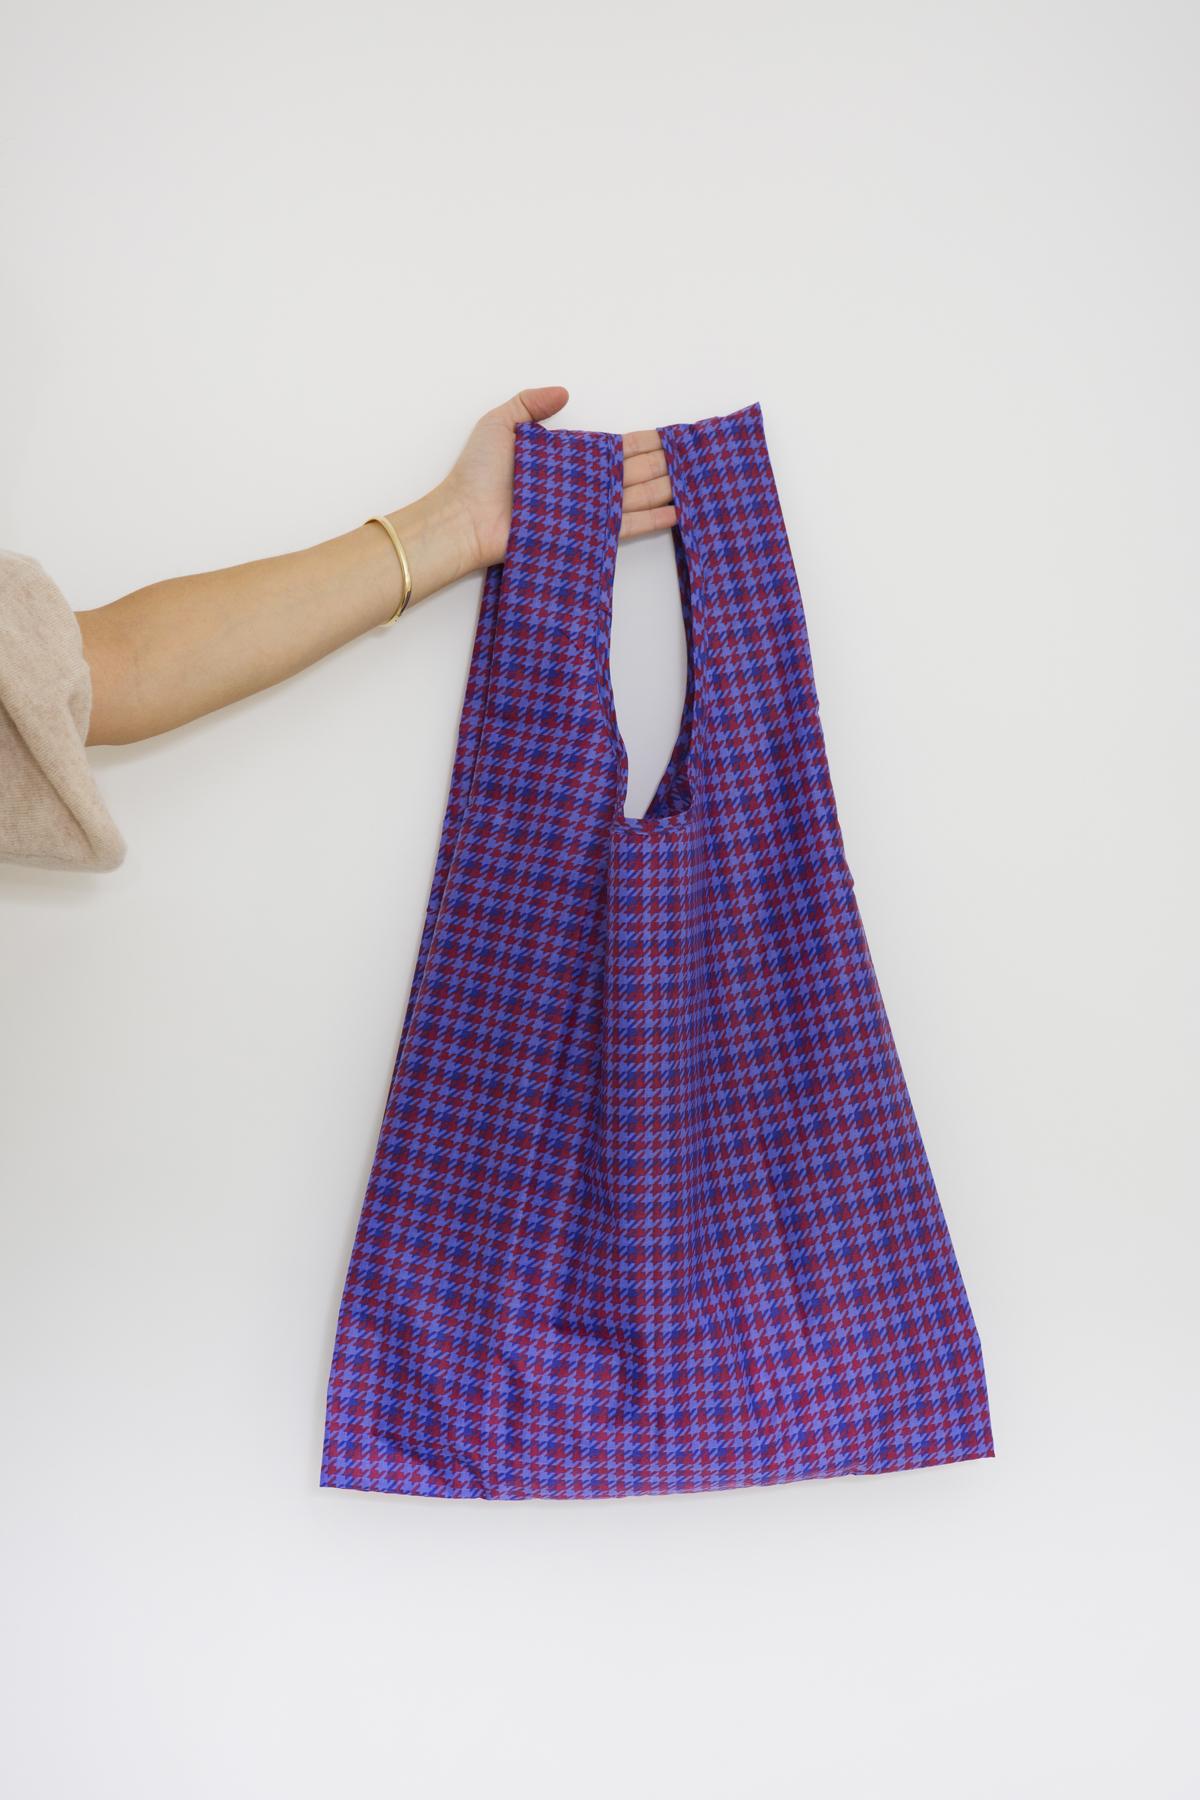 standard-bag-purple-check-happy-shopping-nylon-eco-friendly-baggu-matchboxathens